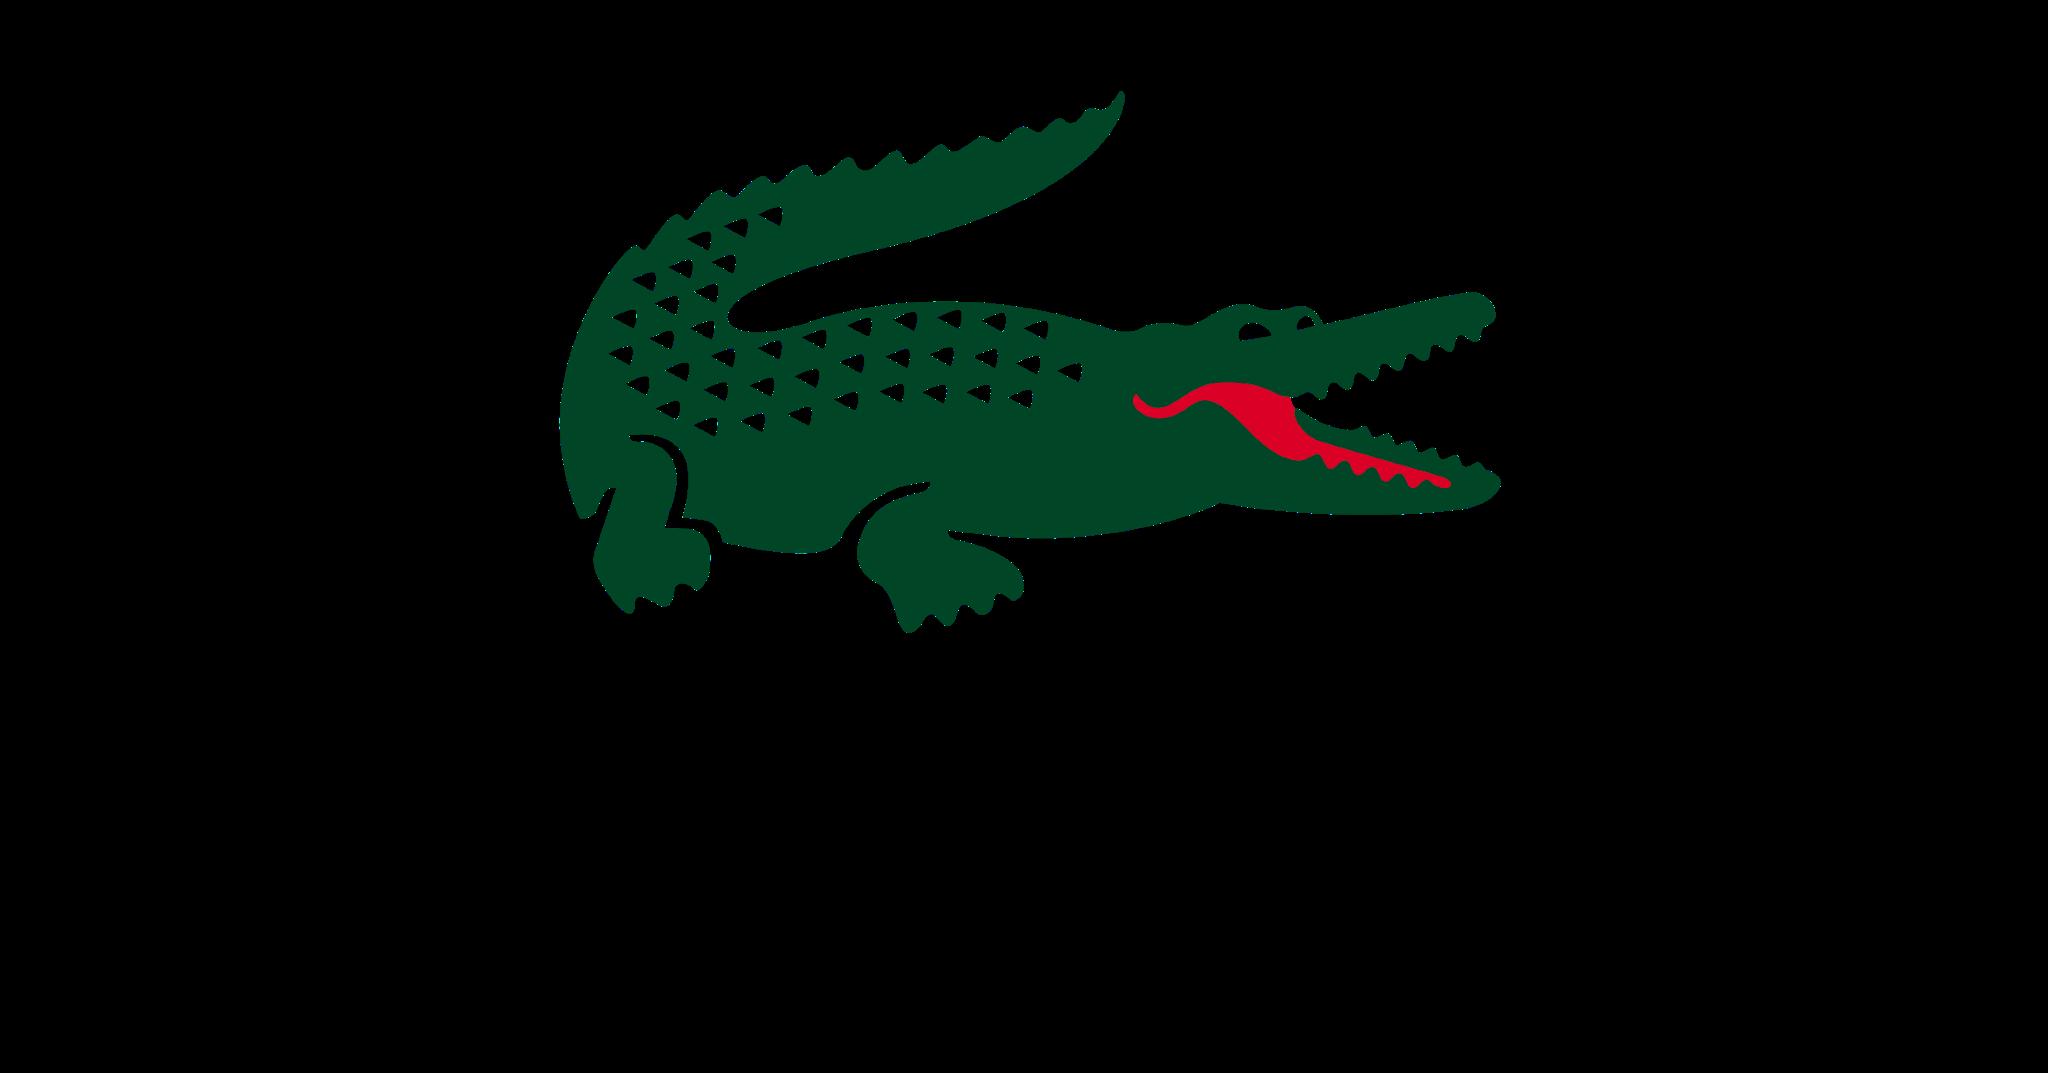 logotipo da empresa de vestuário Lacoste